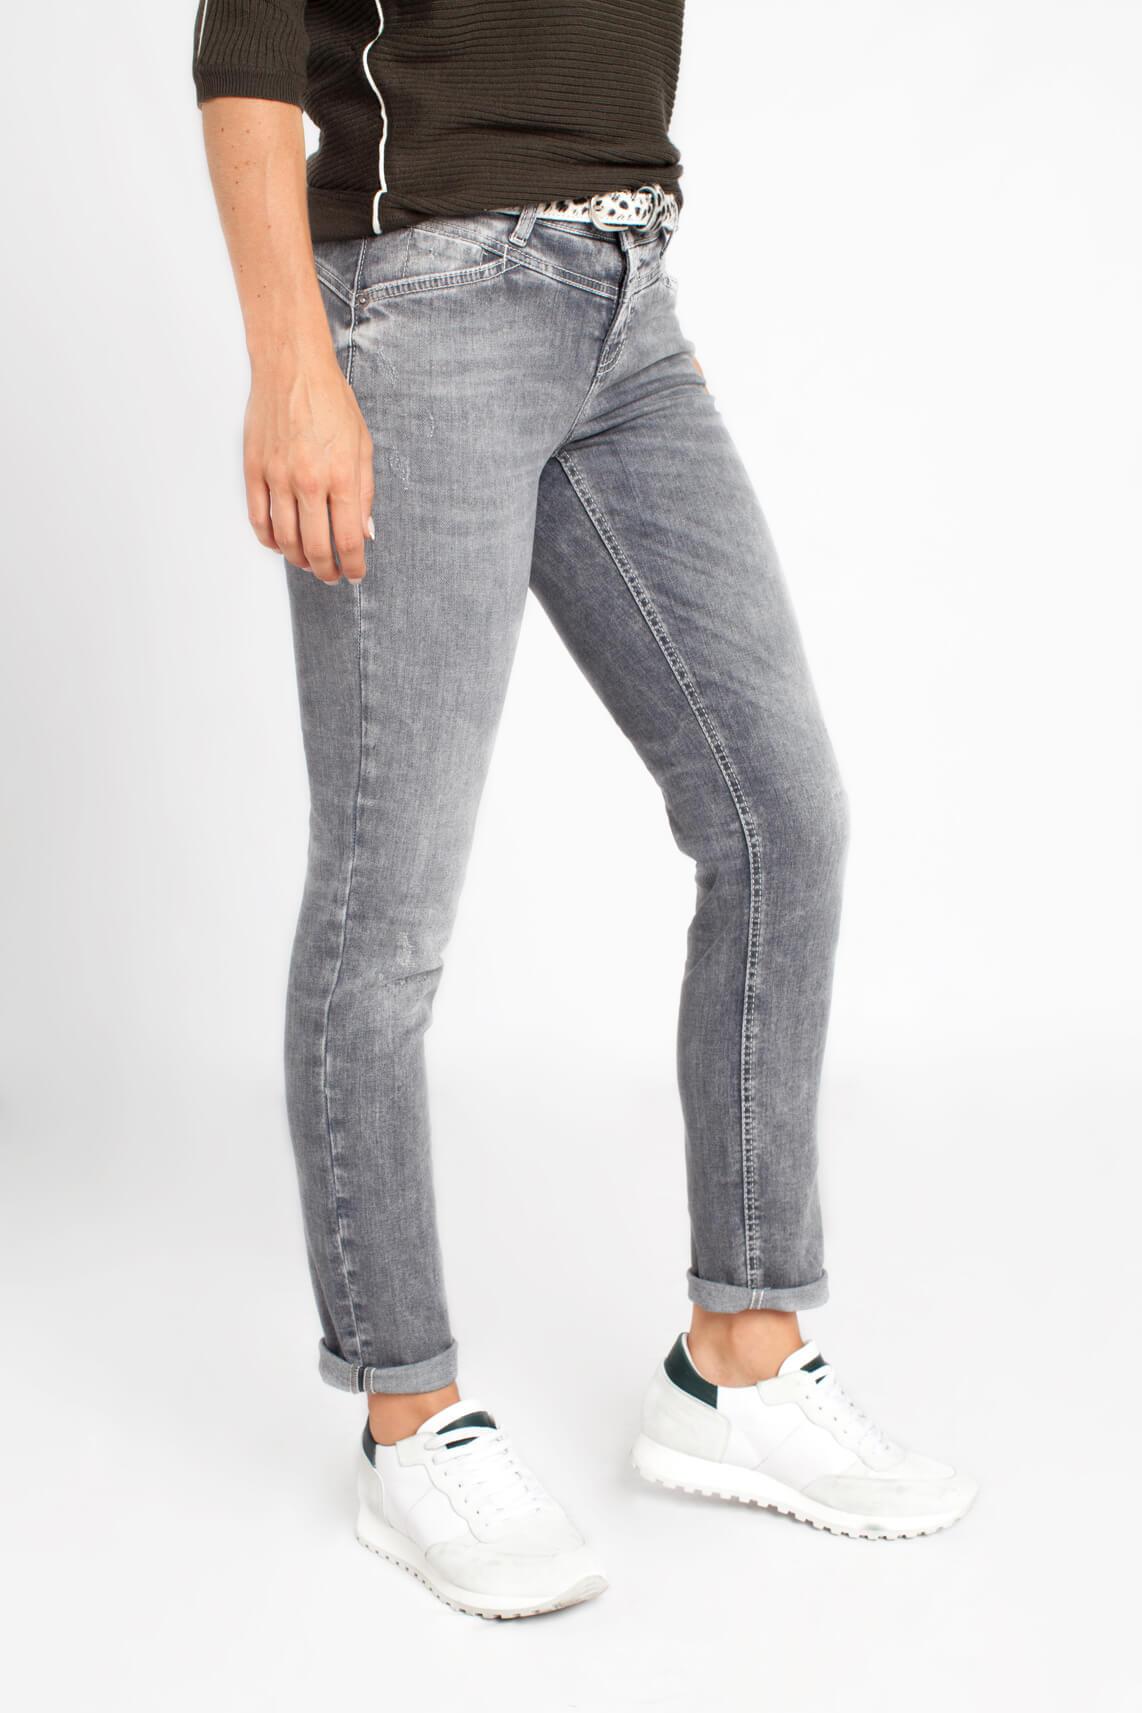 Cambio Dames Liane jeans grijs Grijs